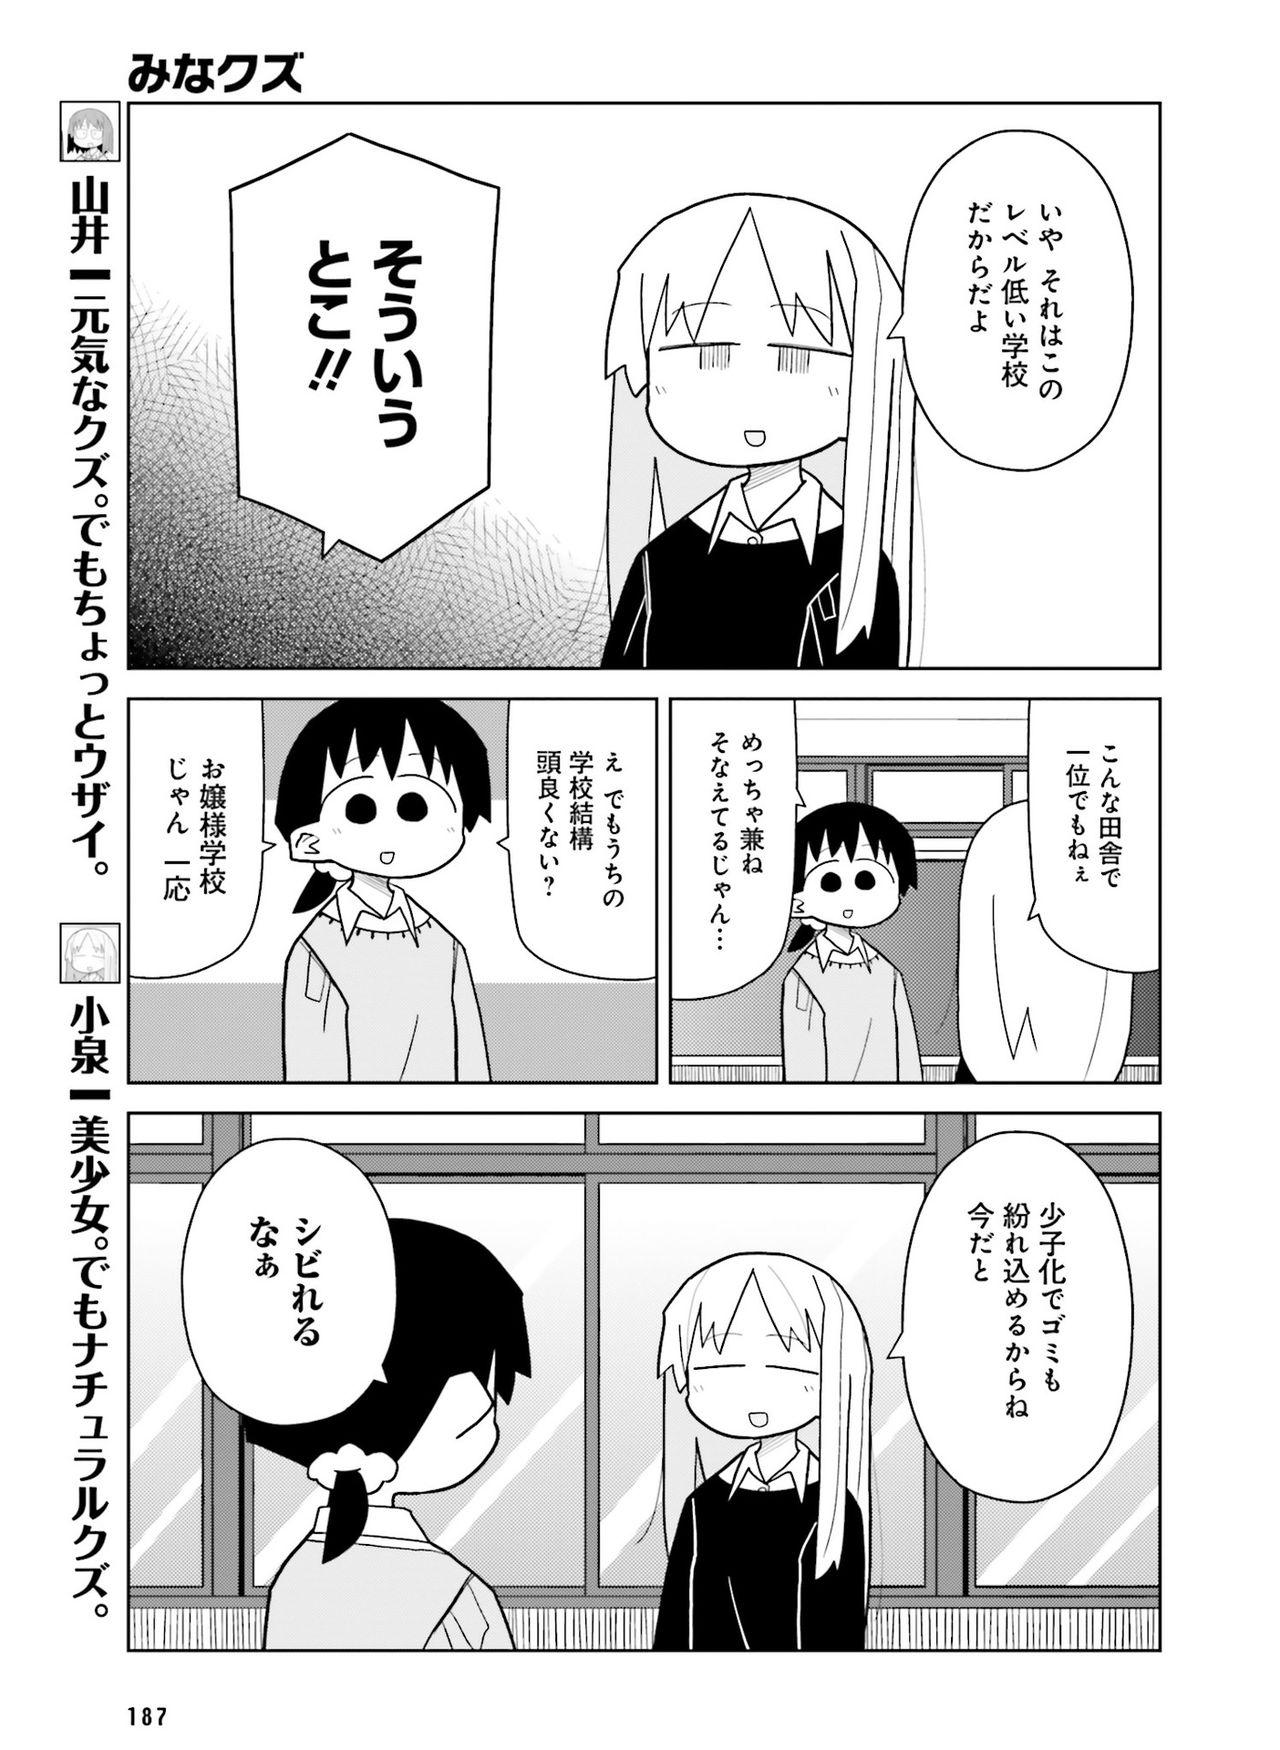 Dengeki Moeoh 2016-12 178